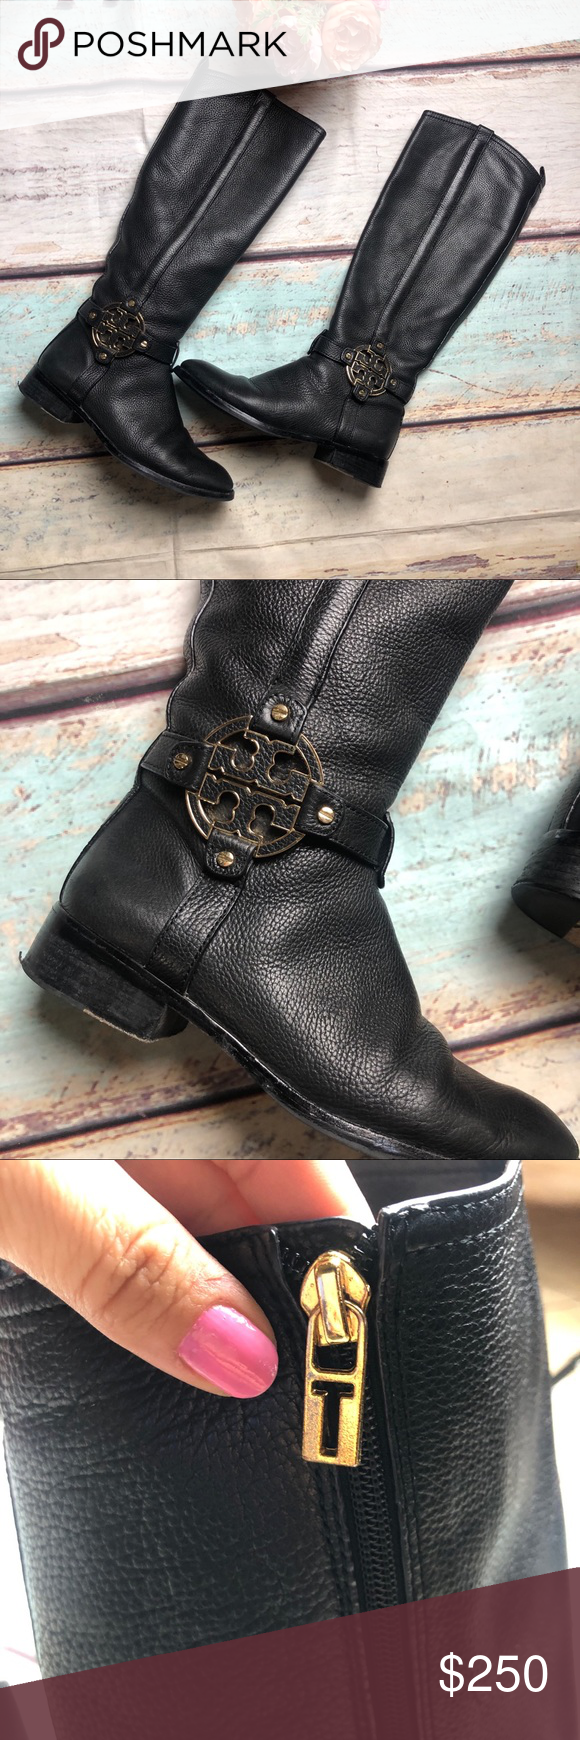 39c23b657fa0 Tory Burch Black leather Amanda Riding boots gold Tory Burch Size 8  Gorgeous Black Amanda Tumbled